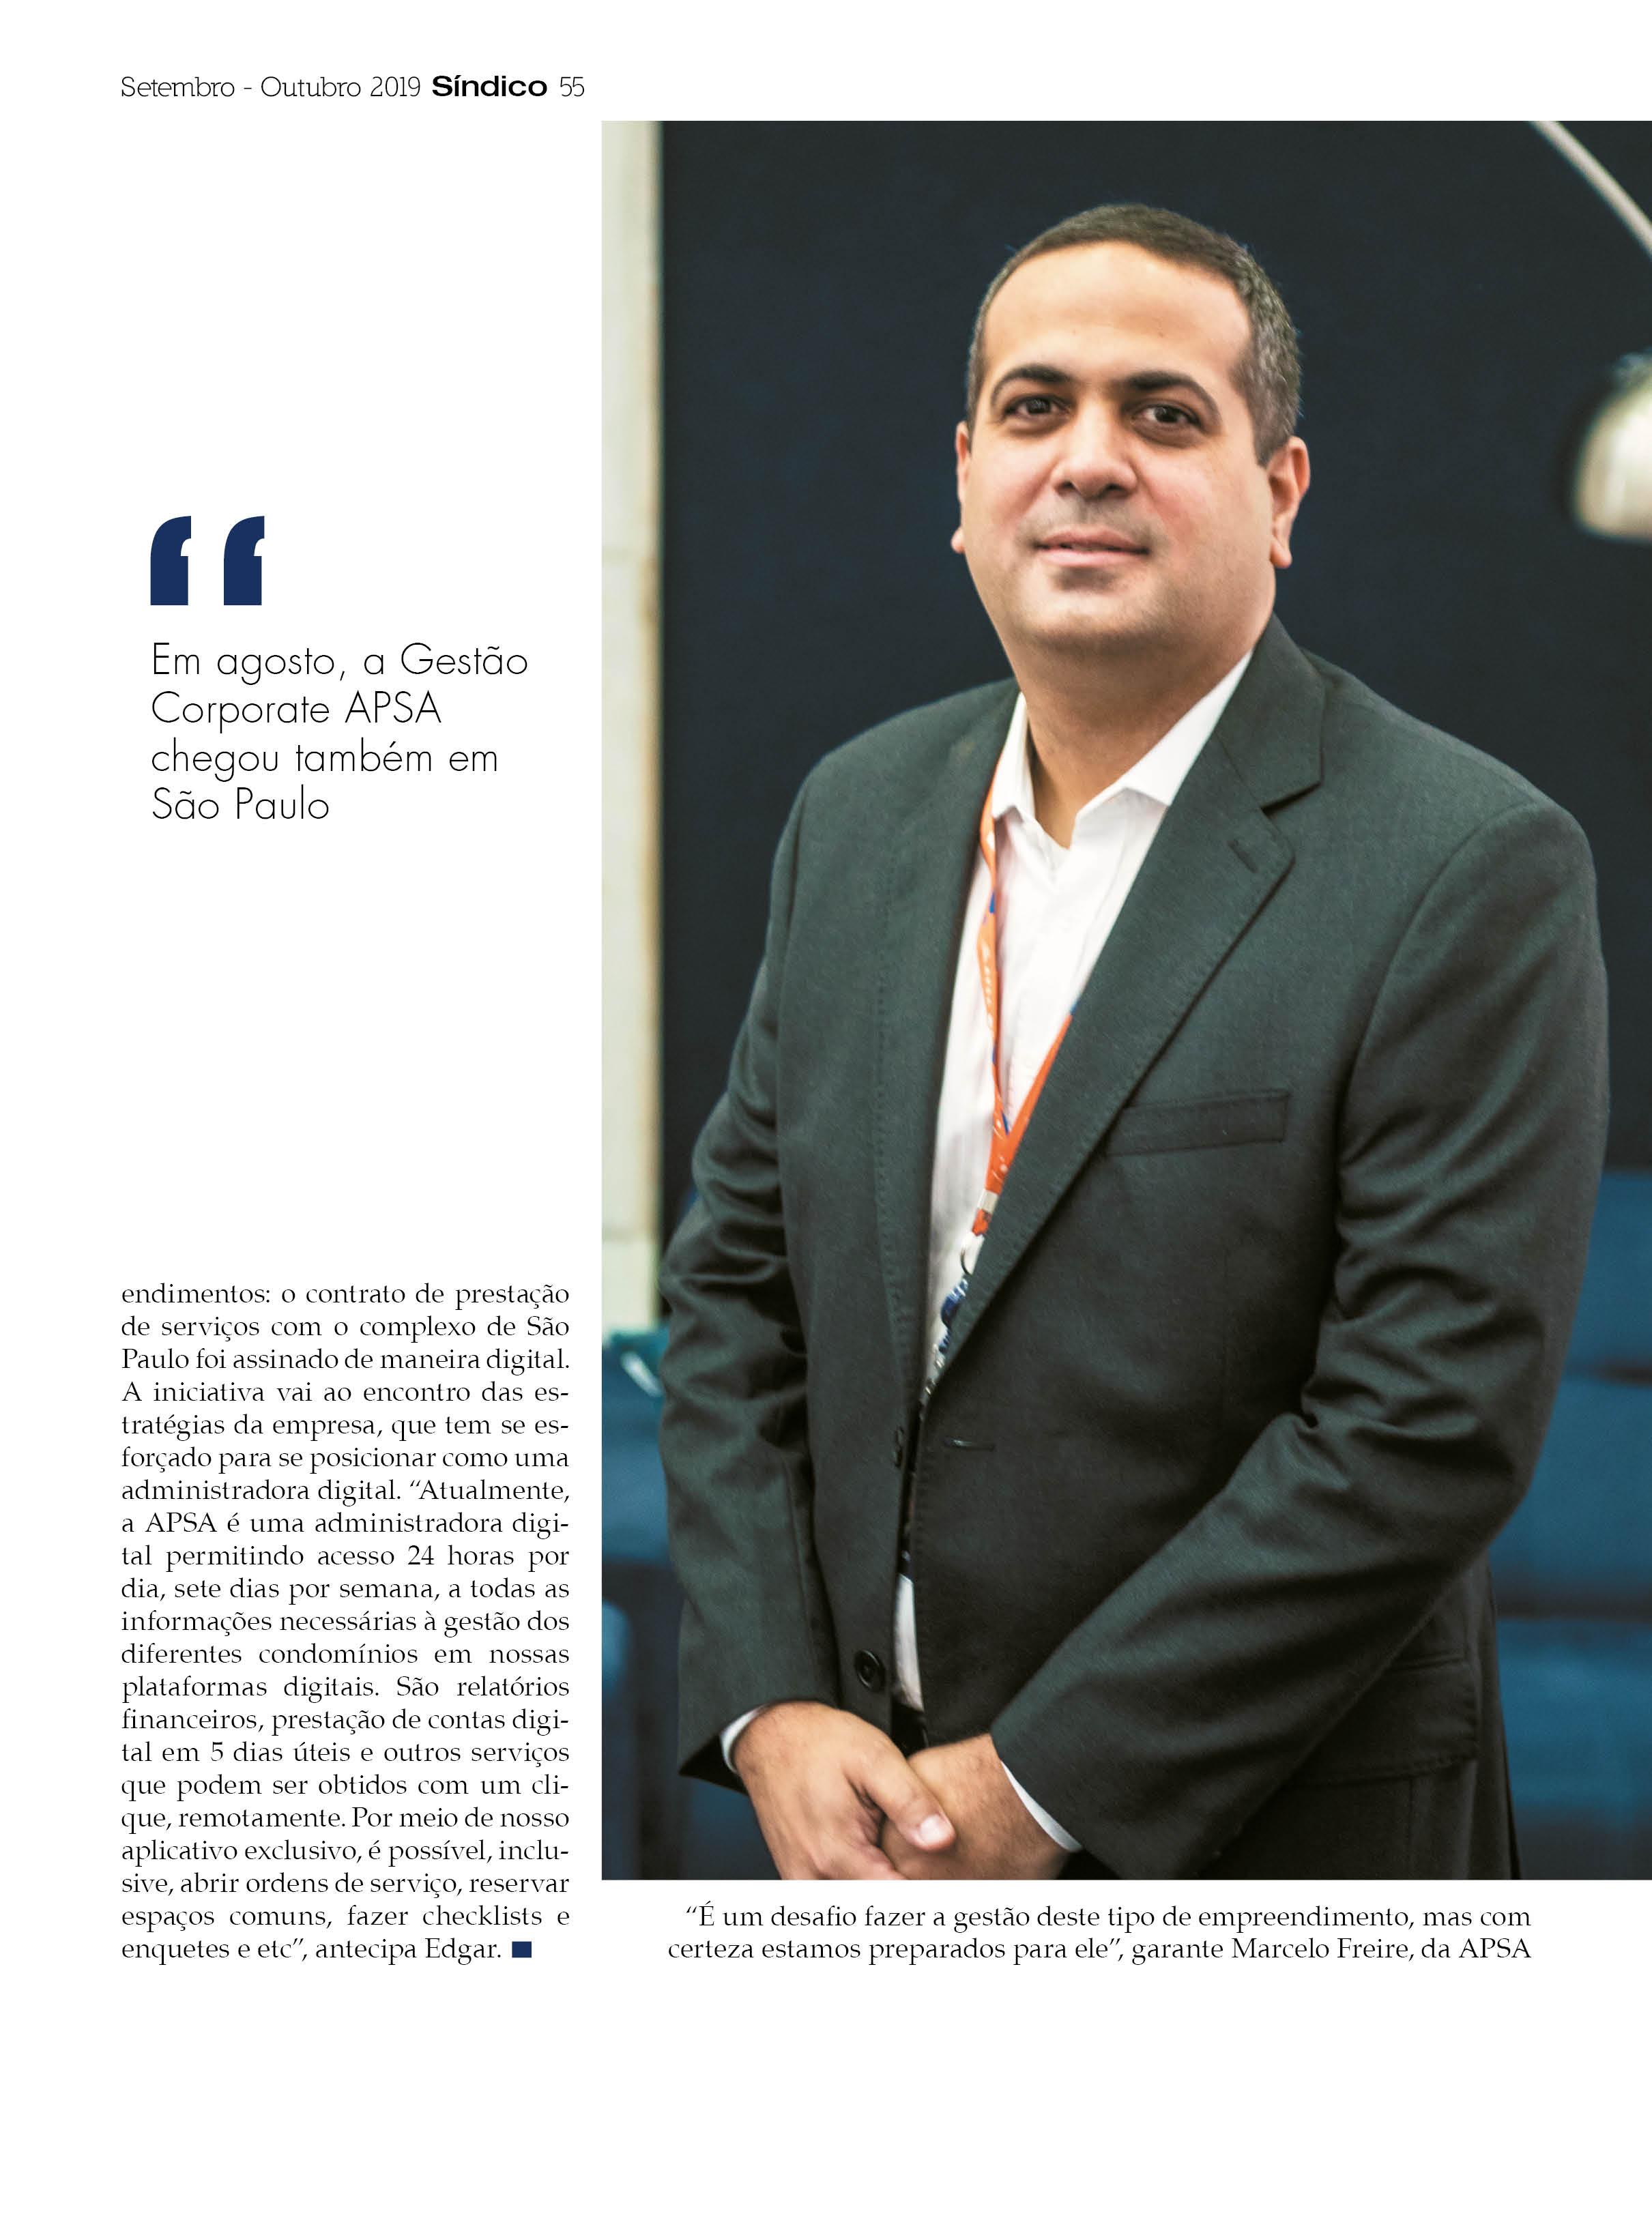 Revista Síndico_ed 246_53